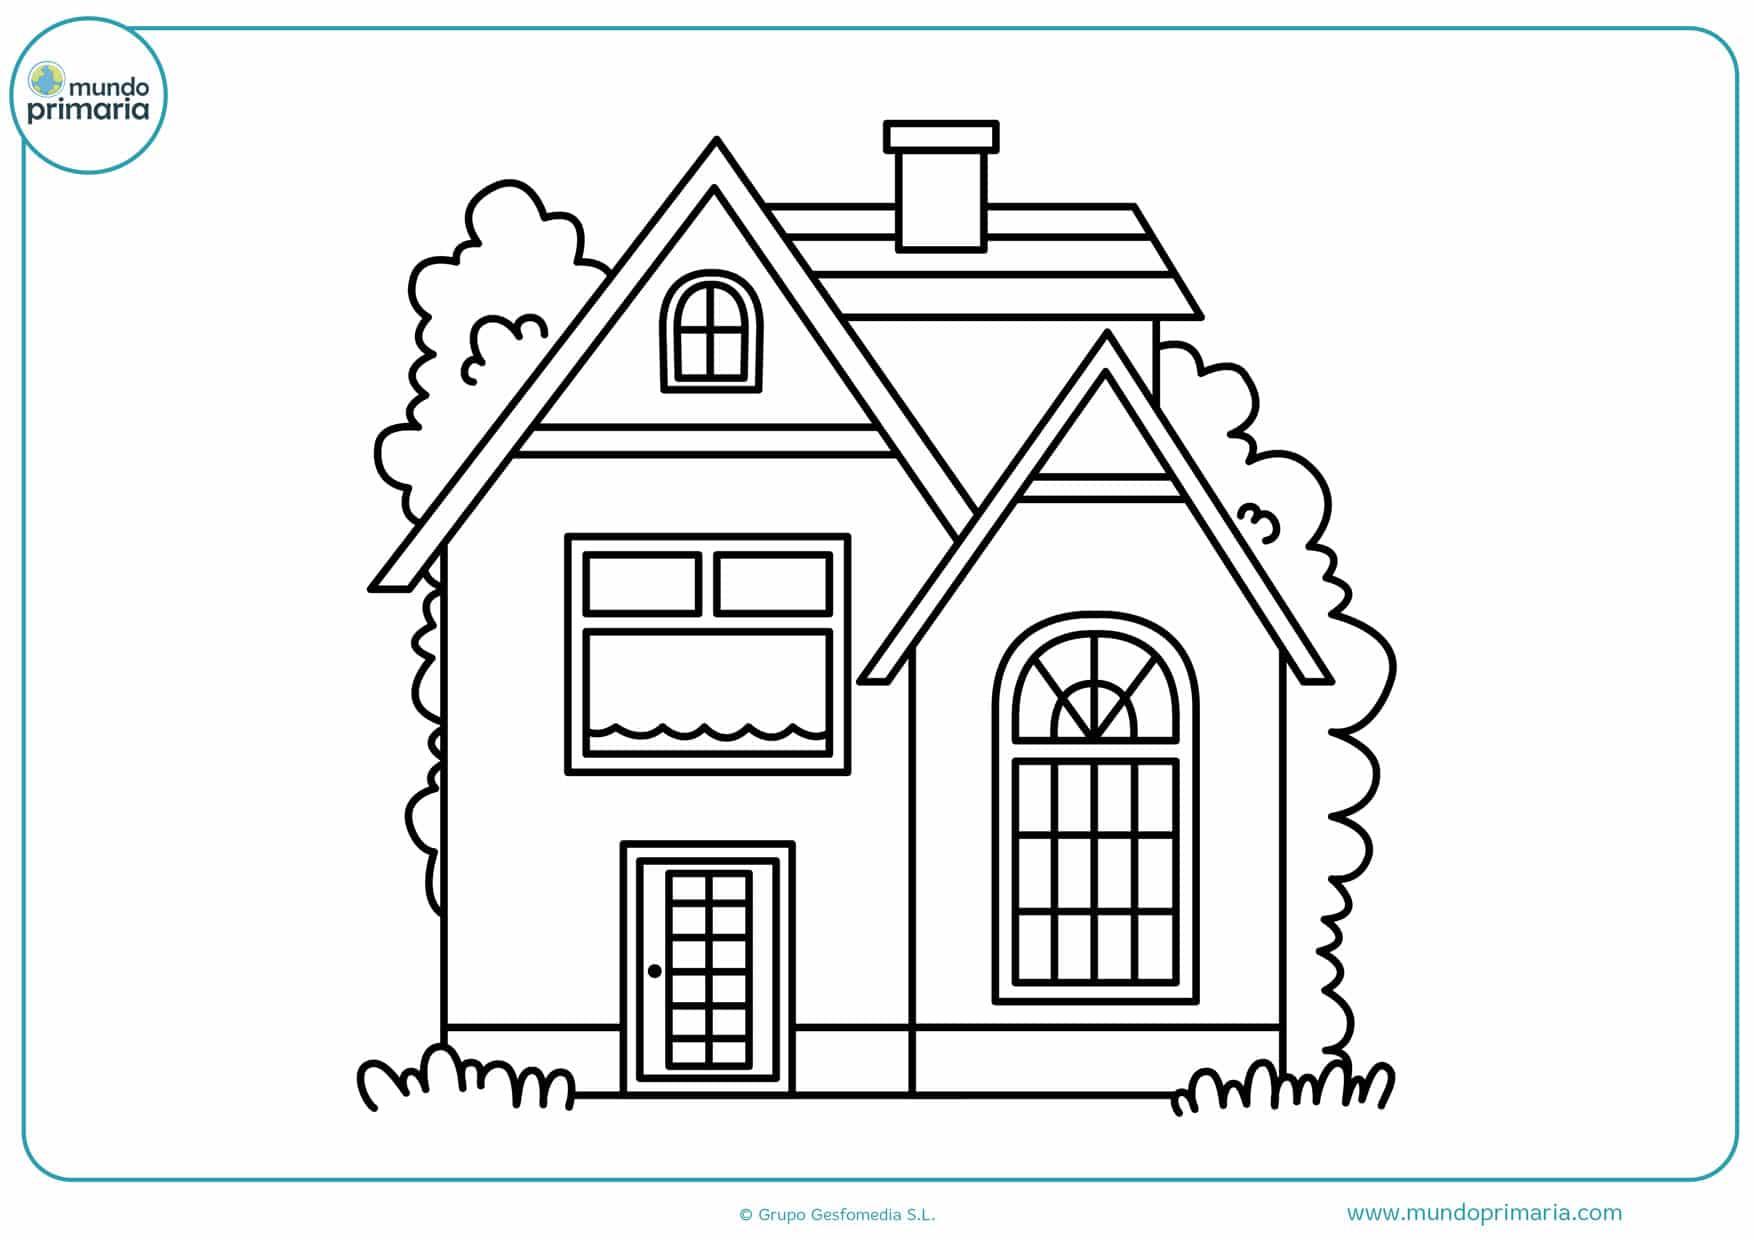 dibujos de casas fáciles para colorear